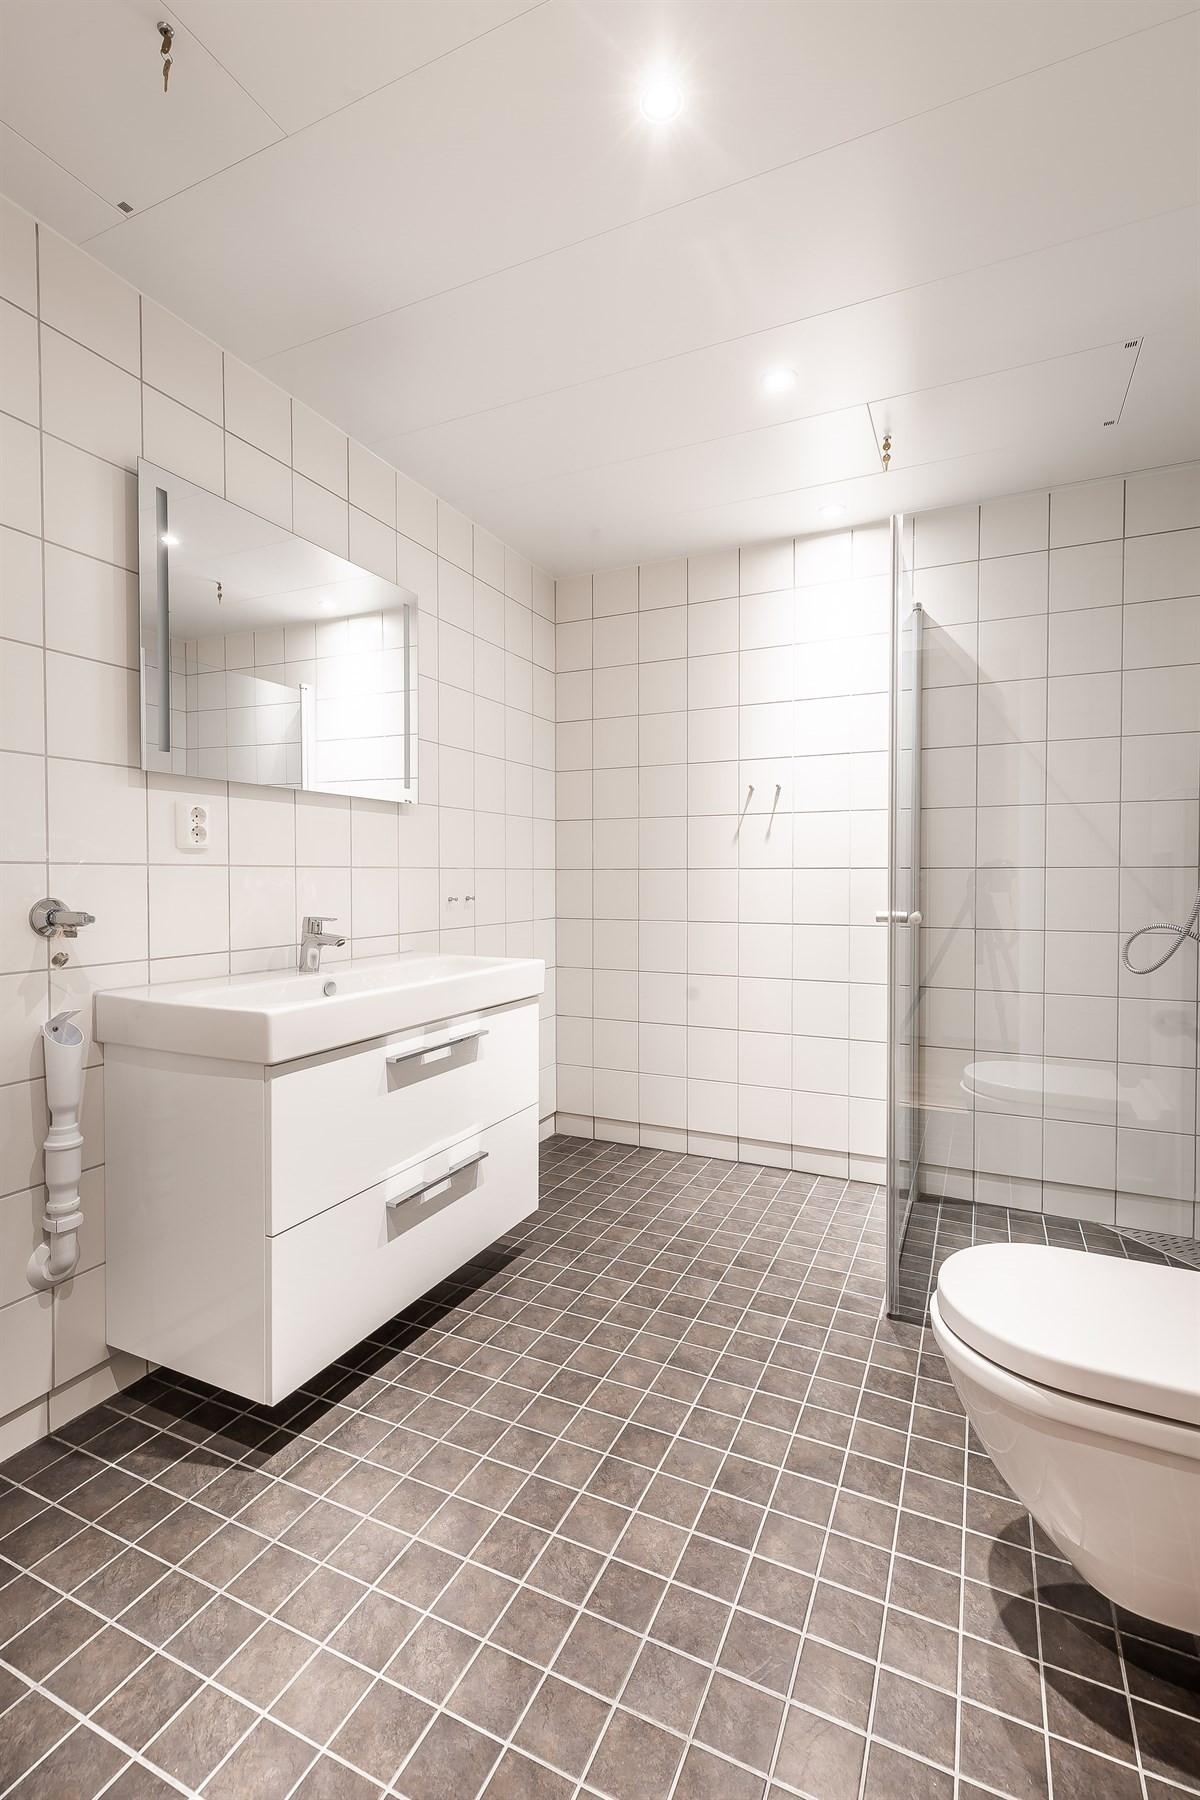 Fliselagt baderom med dusjhjørne